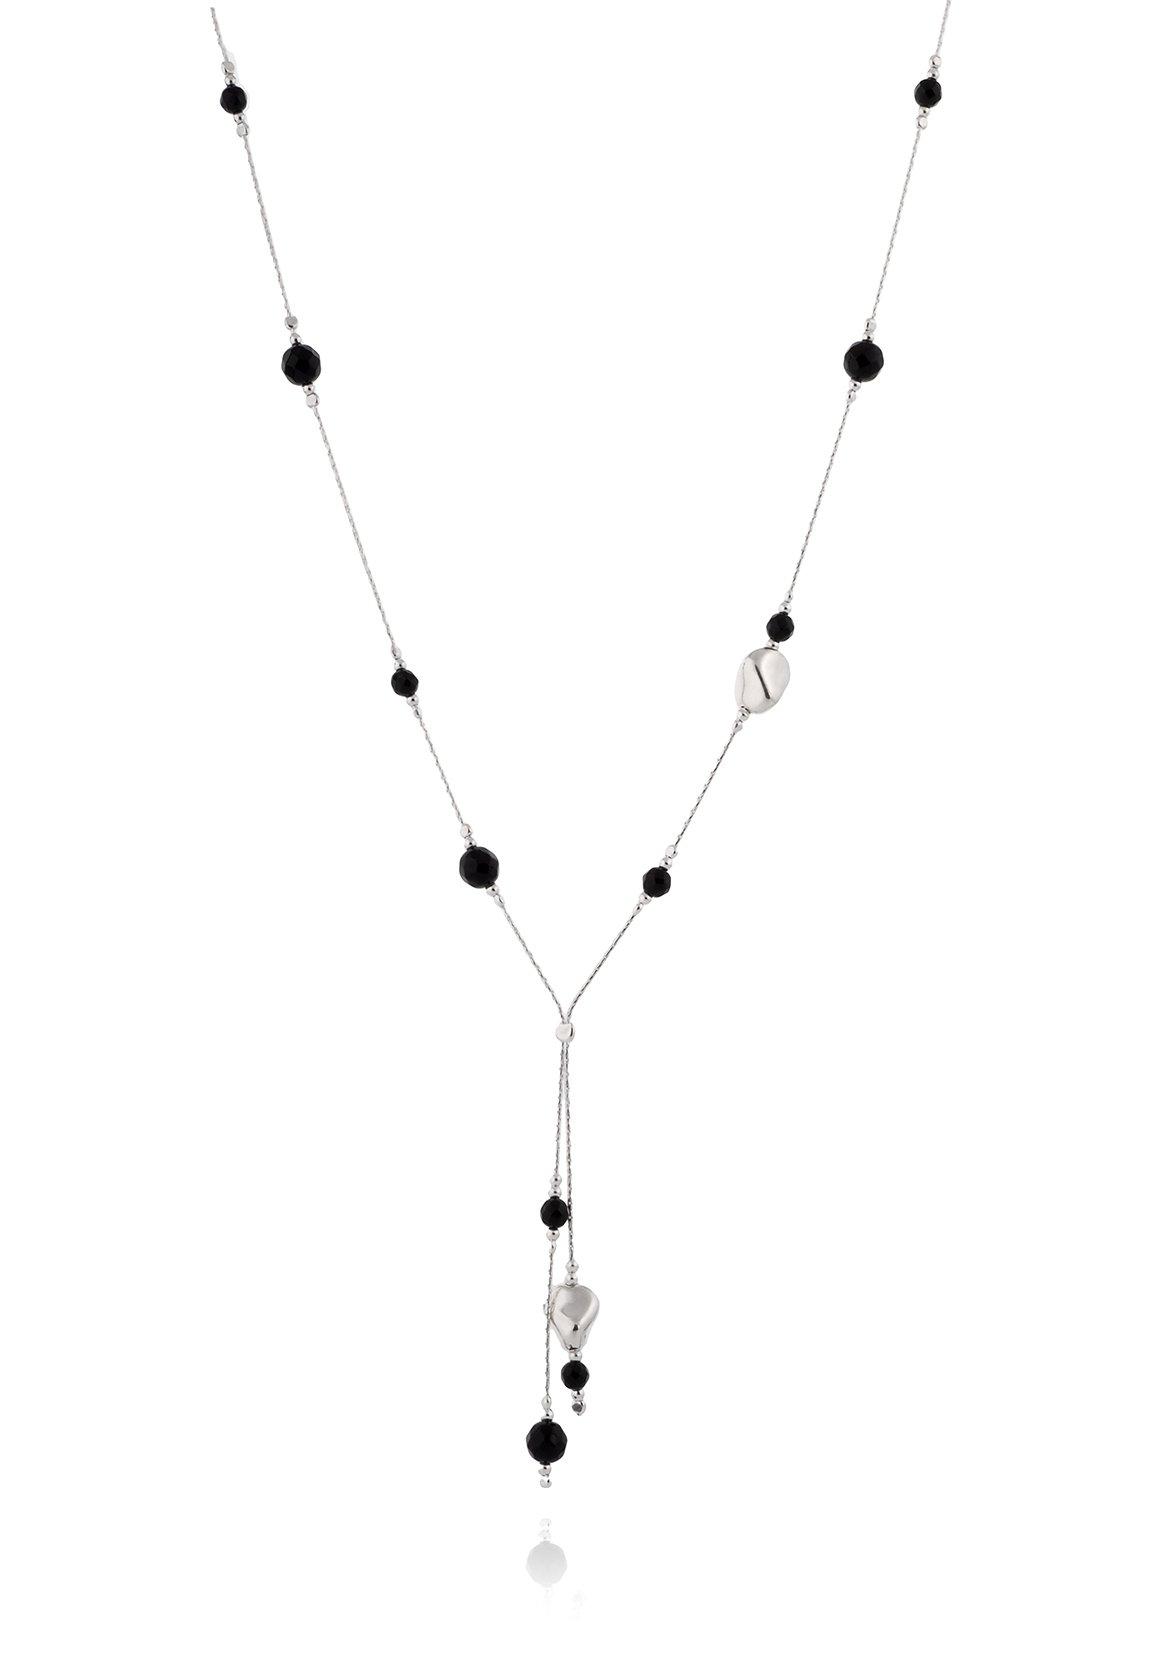 CaratYogi Pure Black Onyx Pendant Pear Drop Shape 925 Sterling Silver For Women Chakra Healing Necklace